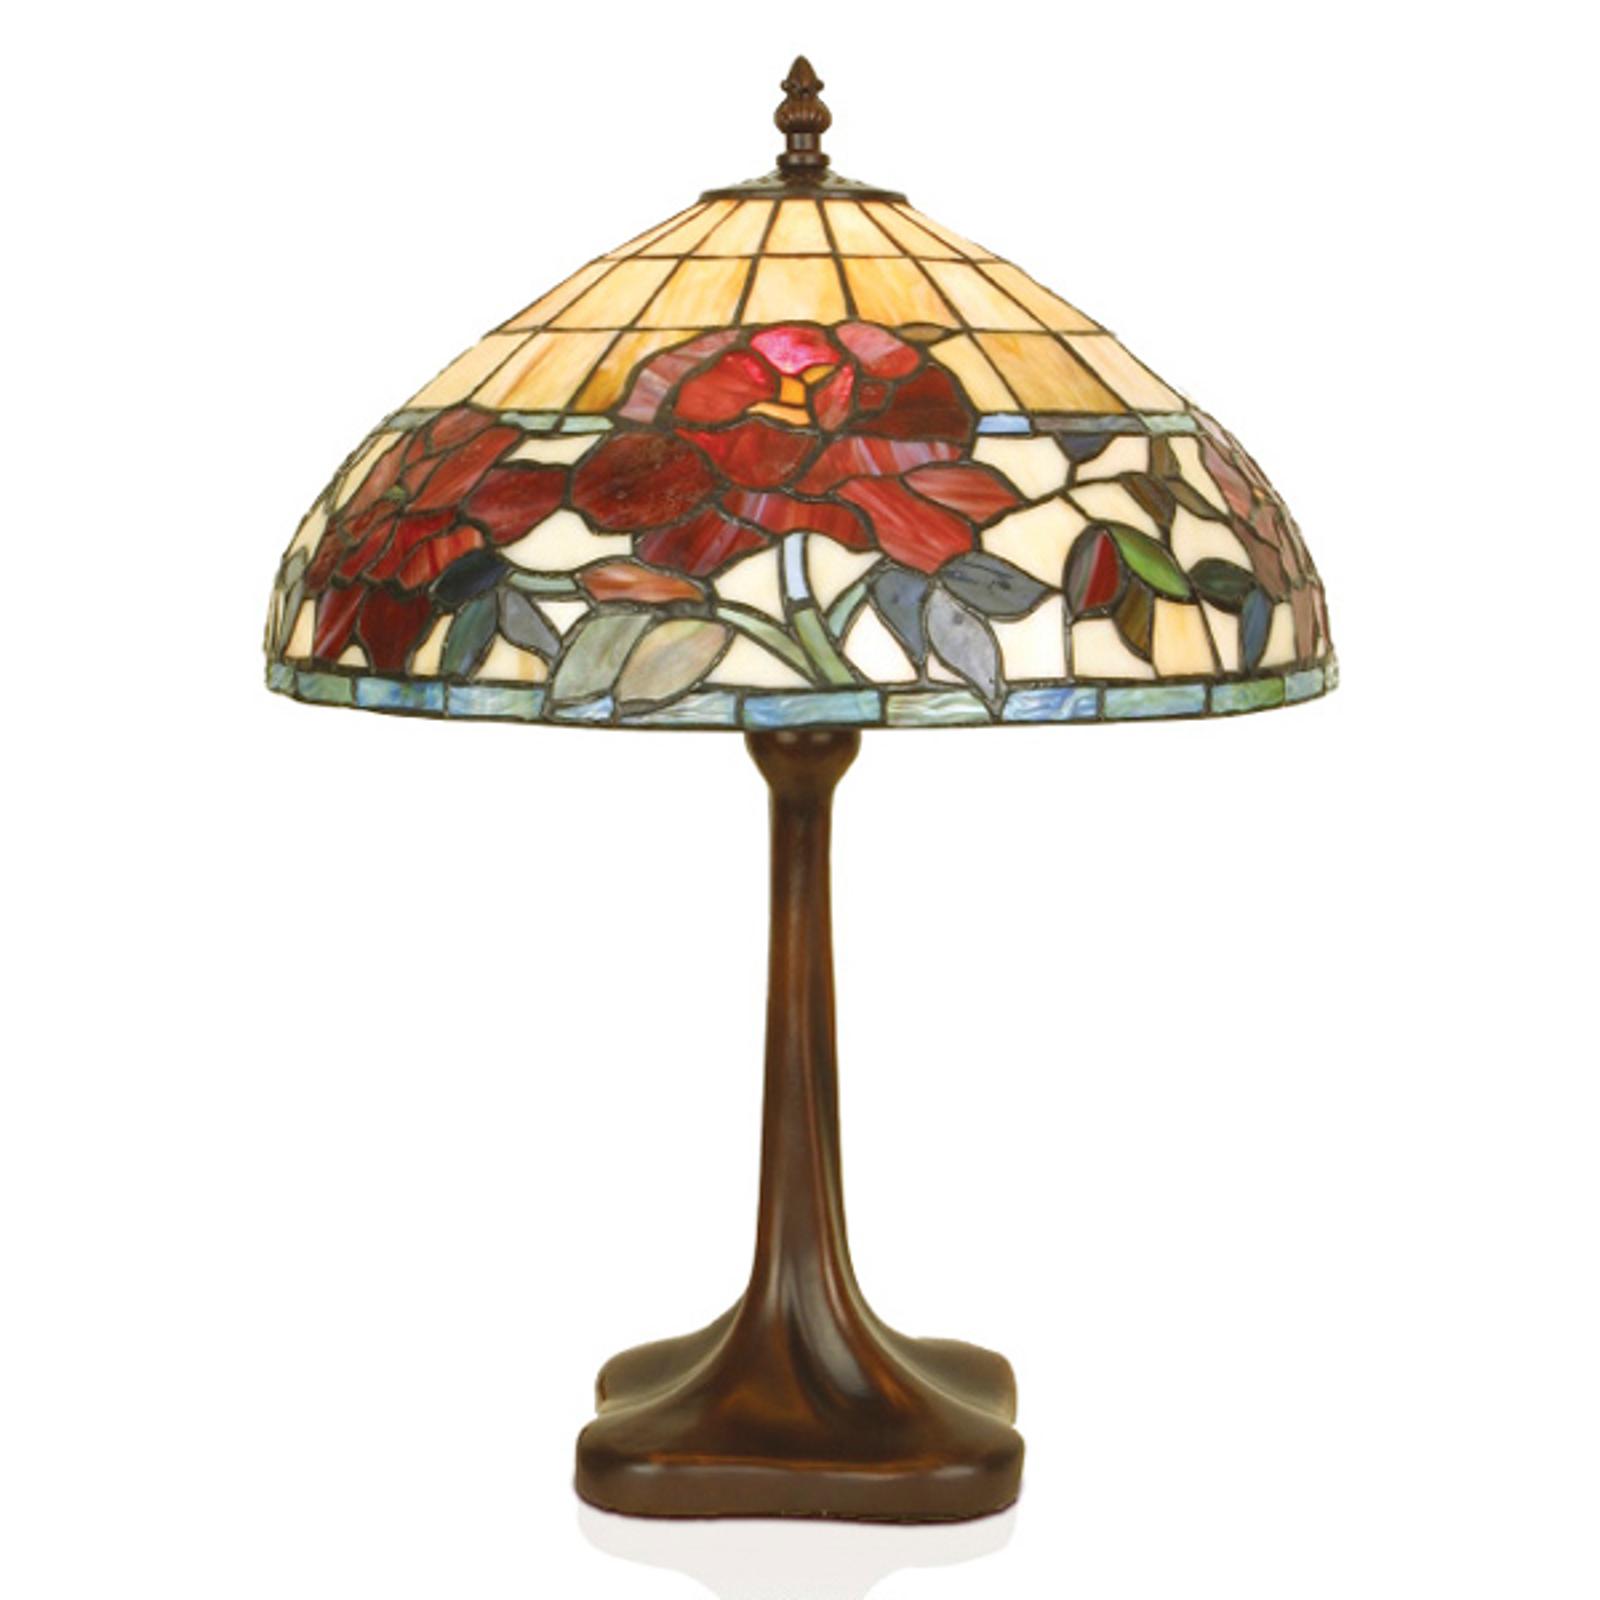 Handmade table lamp FINNA_1032178_1